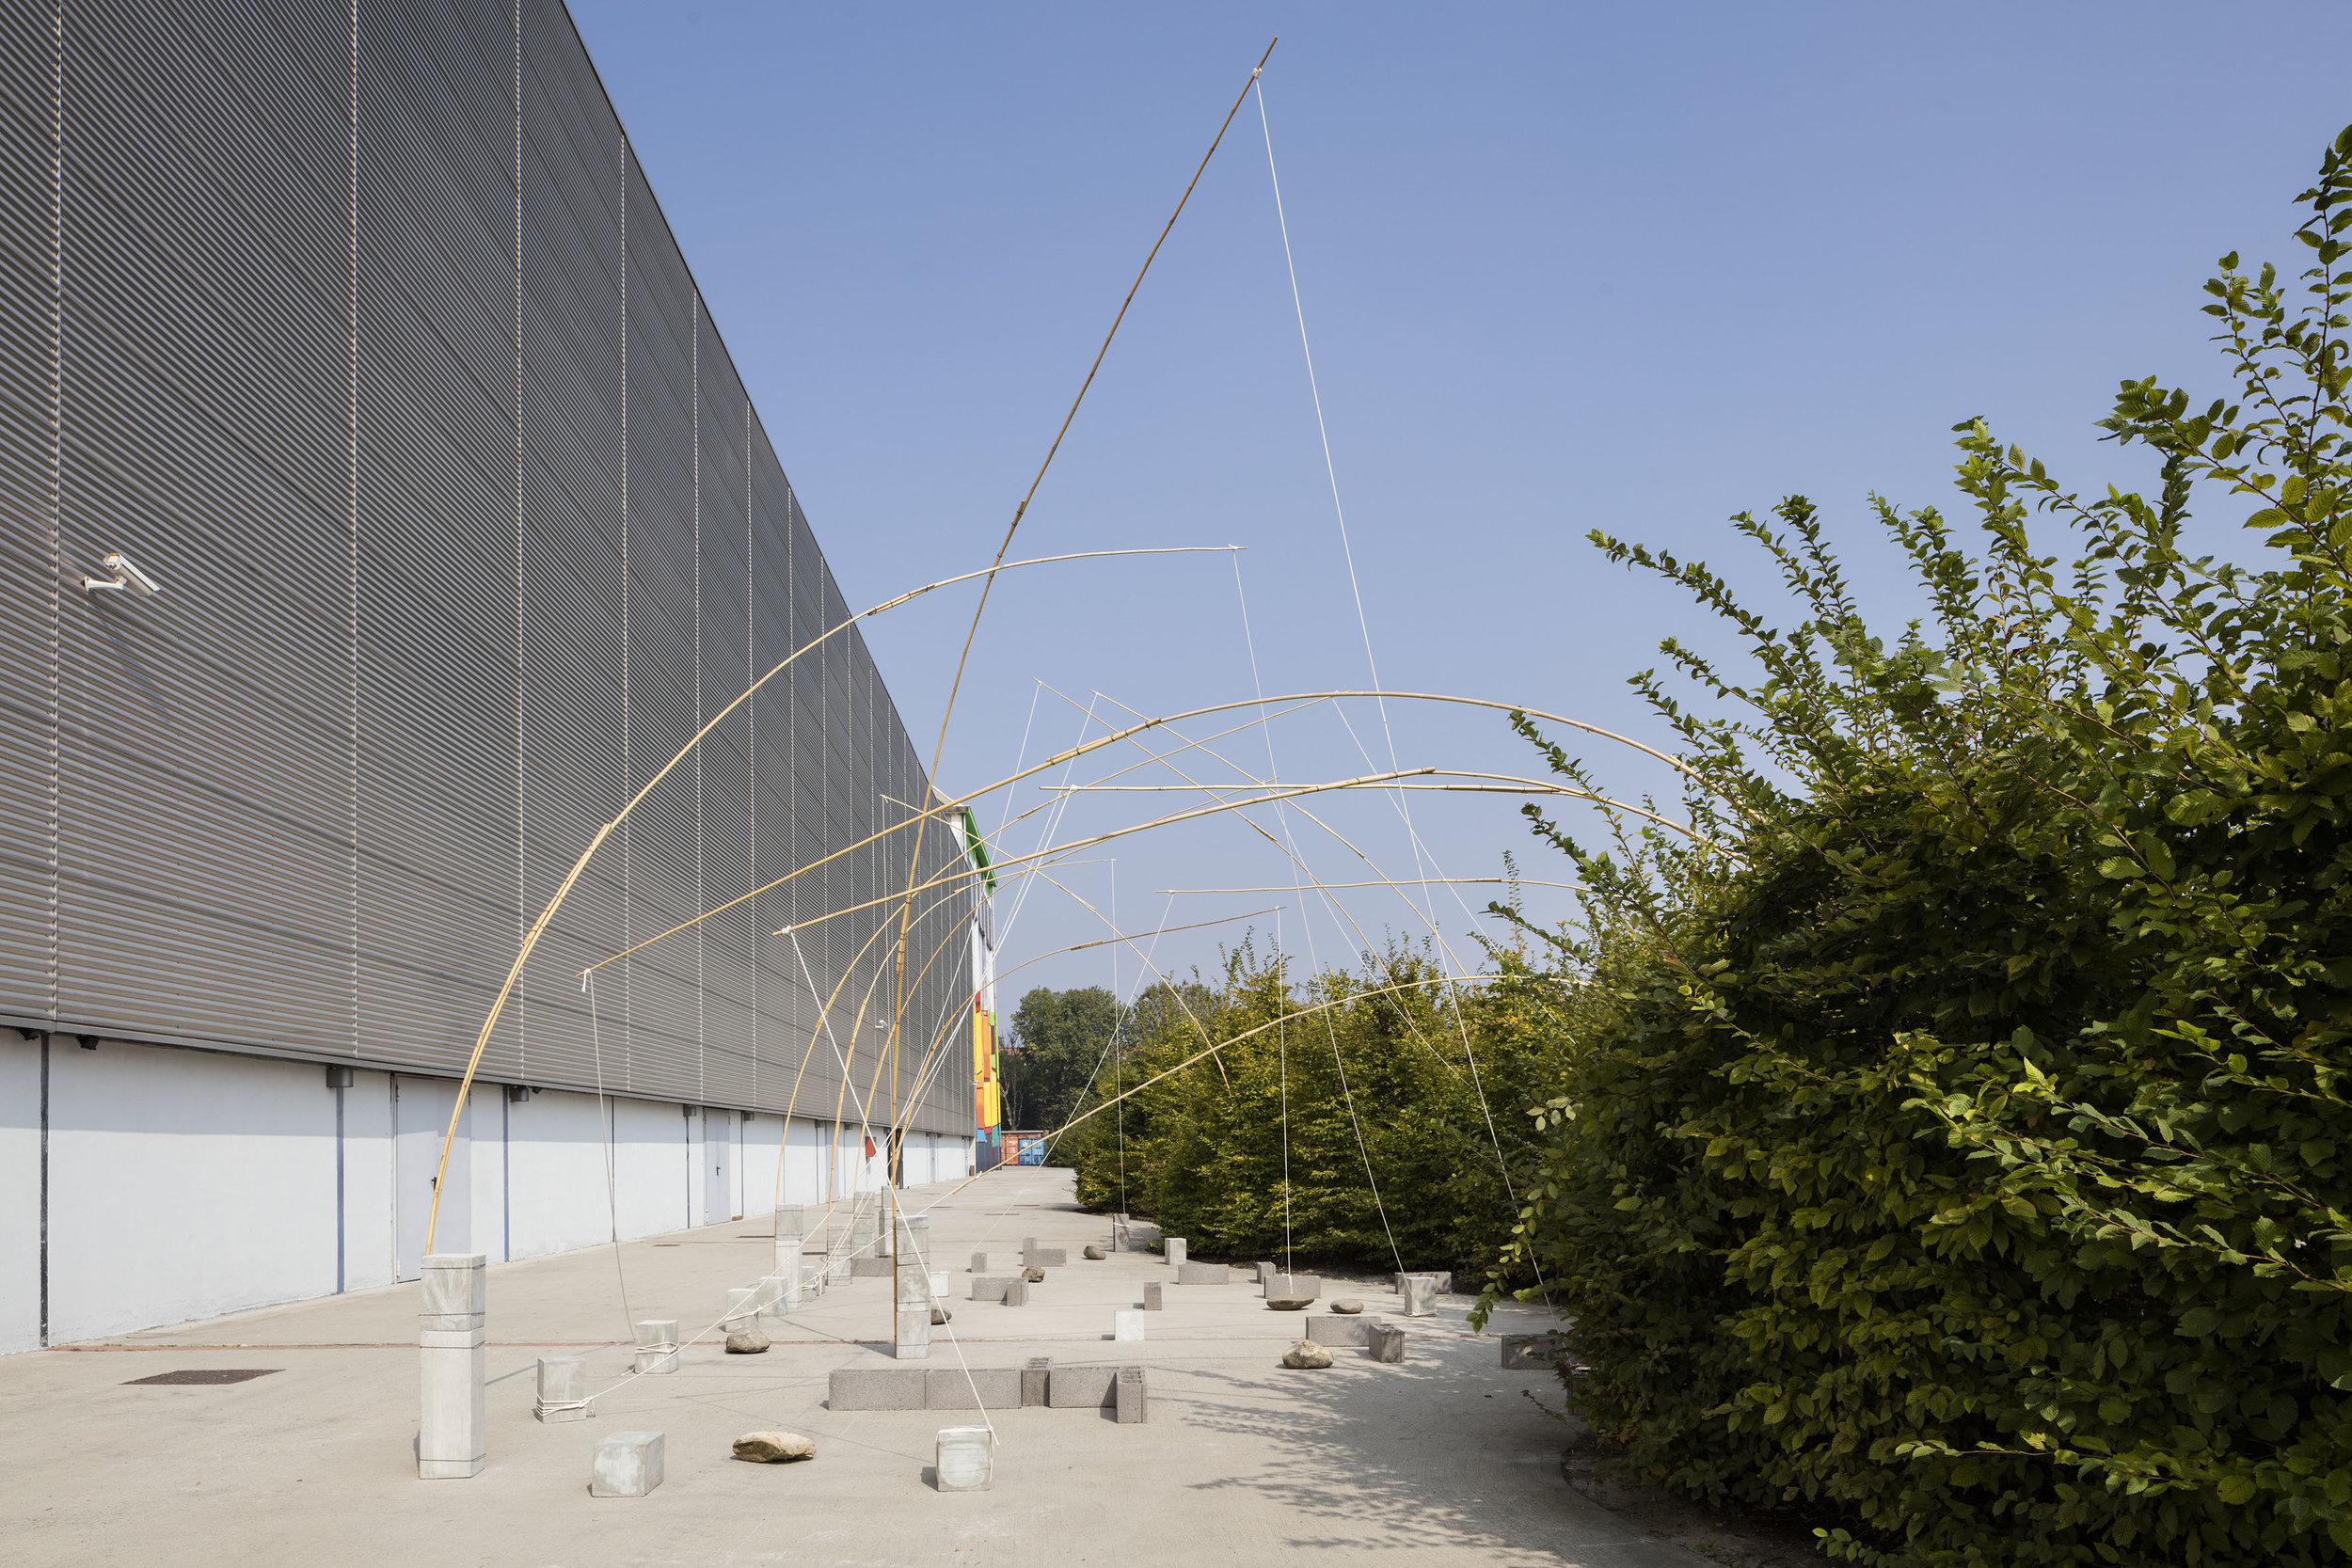 Unfolding Field , 1972/2016 野展( Noten ) bamboo, rope, stones,cement blocks 500 x 2000 x 700 c Installation view, Kishio Suga: Situations , Pirelli HangarBicocca, Milan, 2016 Photo: Agostino Osio; Courtesy Pirelli HangarBicocca, Milan